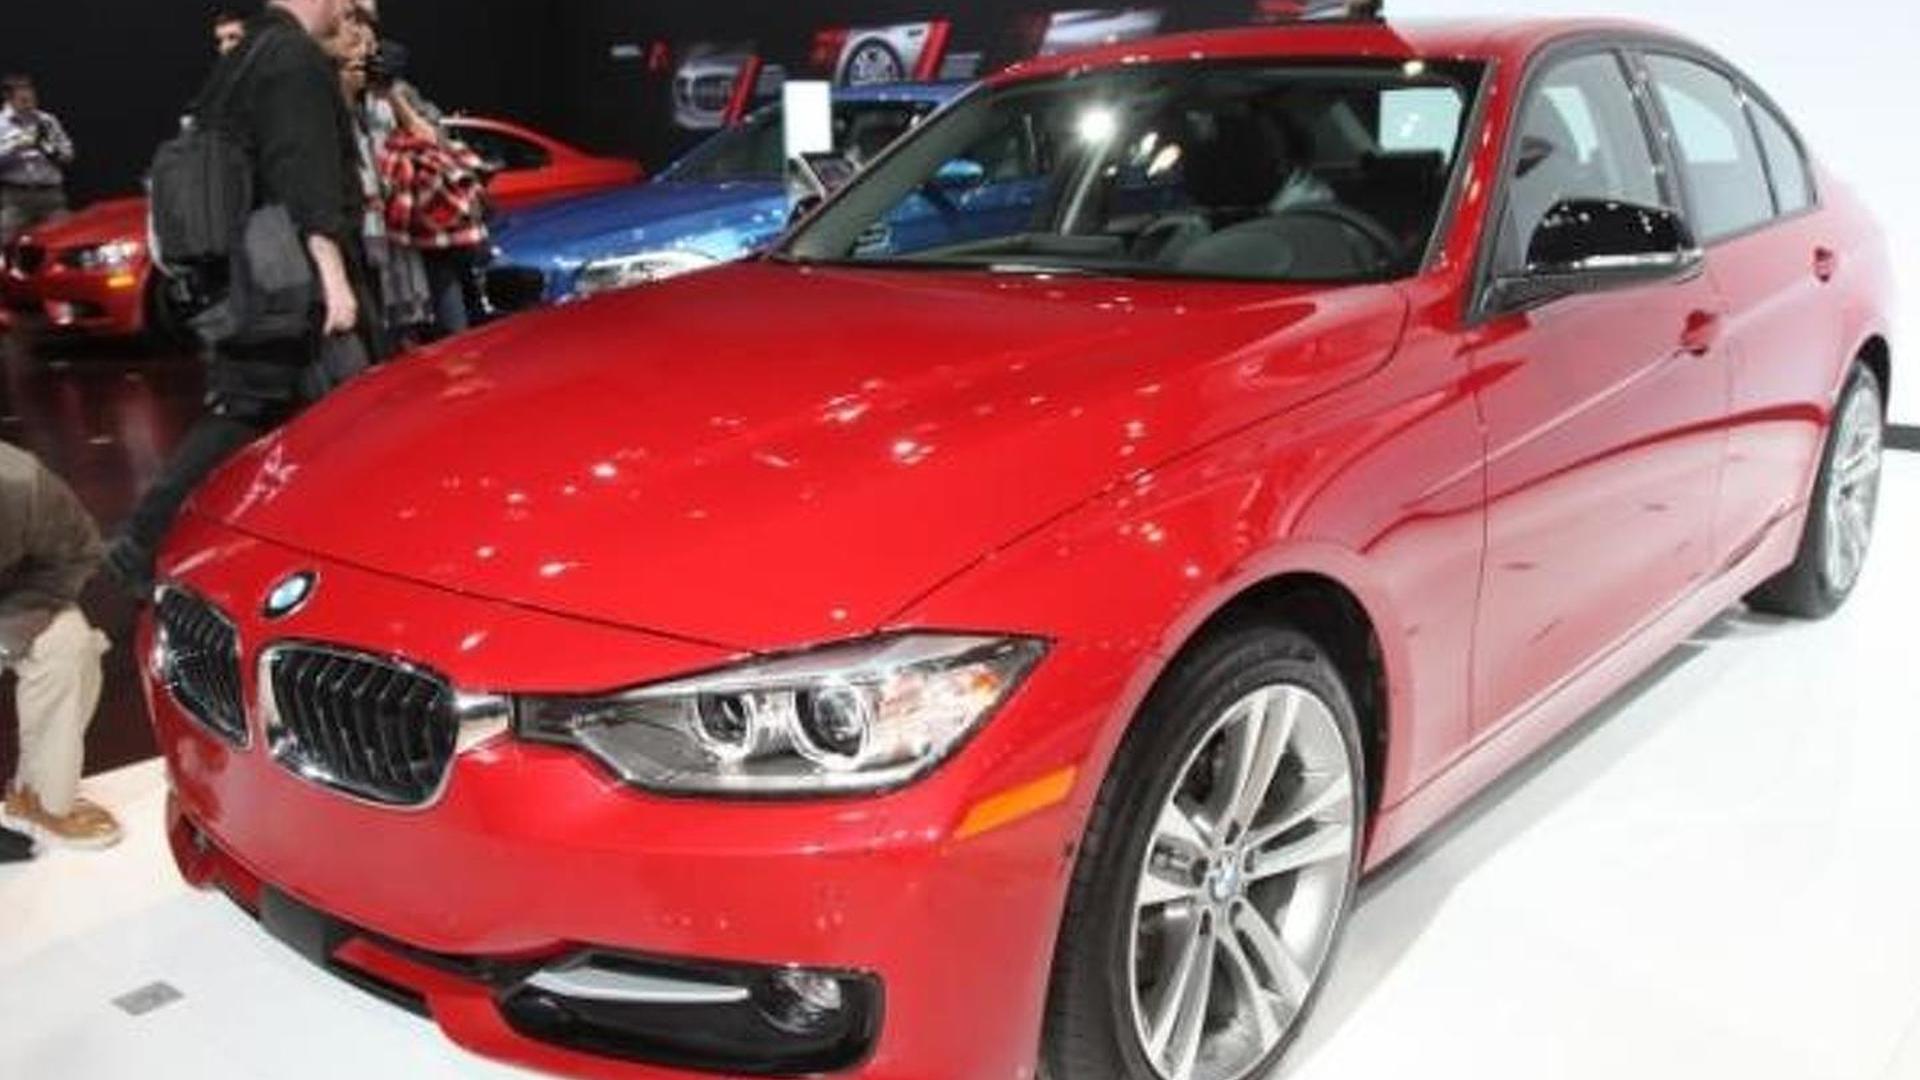 2014 BMW 328d does 32 mpg city / 45 mpg hwy